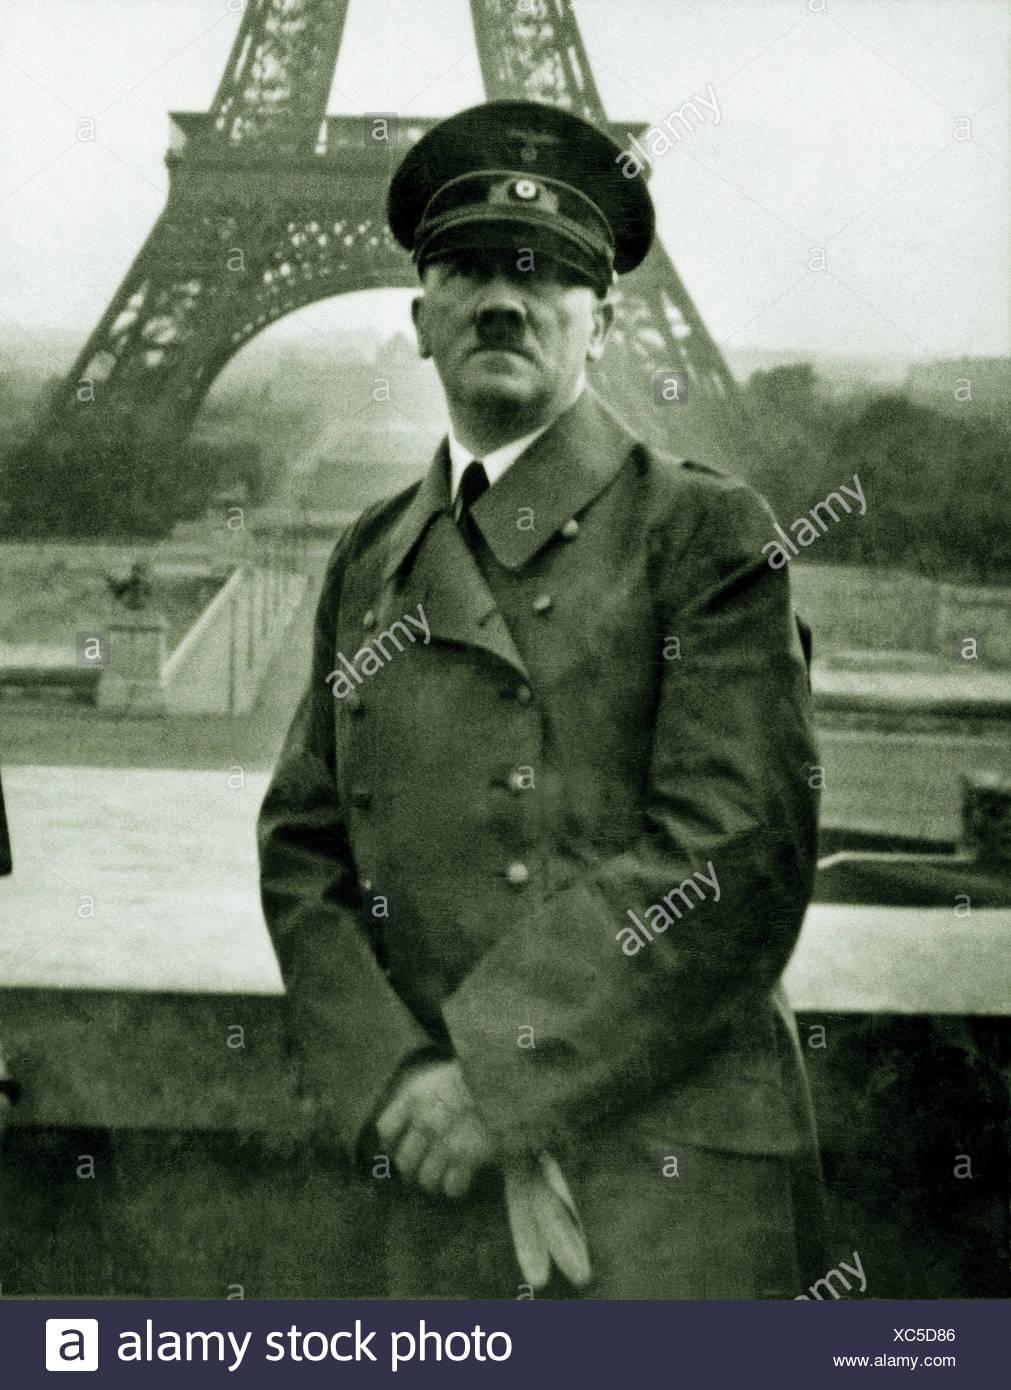 Adolf Hitler, poses, Eiffel Tower, fall, Paris, France, 1940, - Stock Image